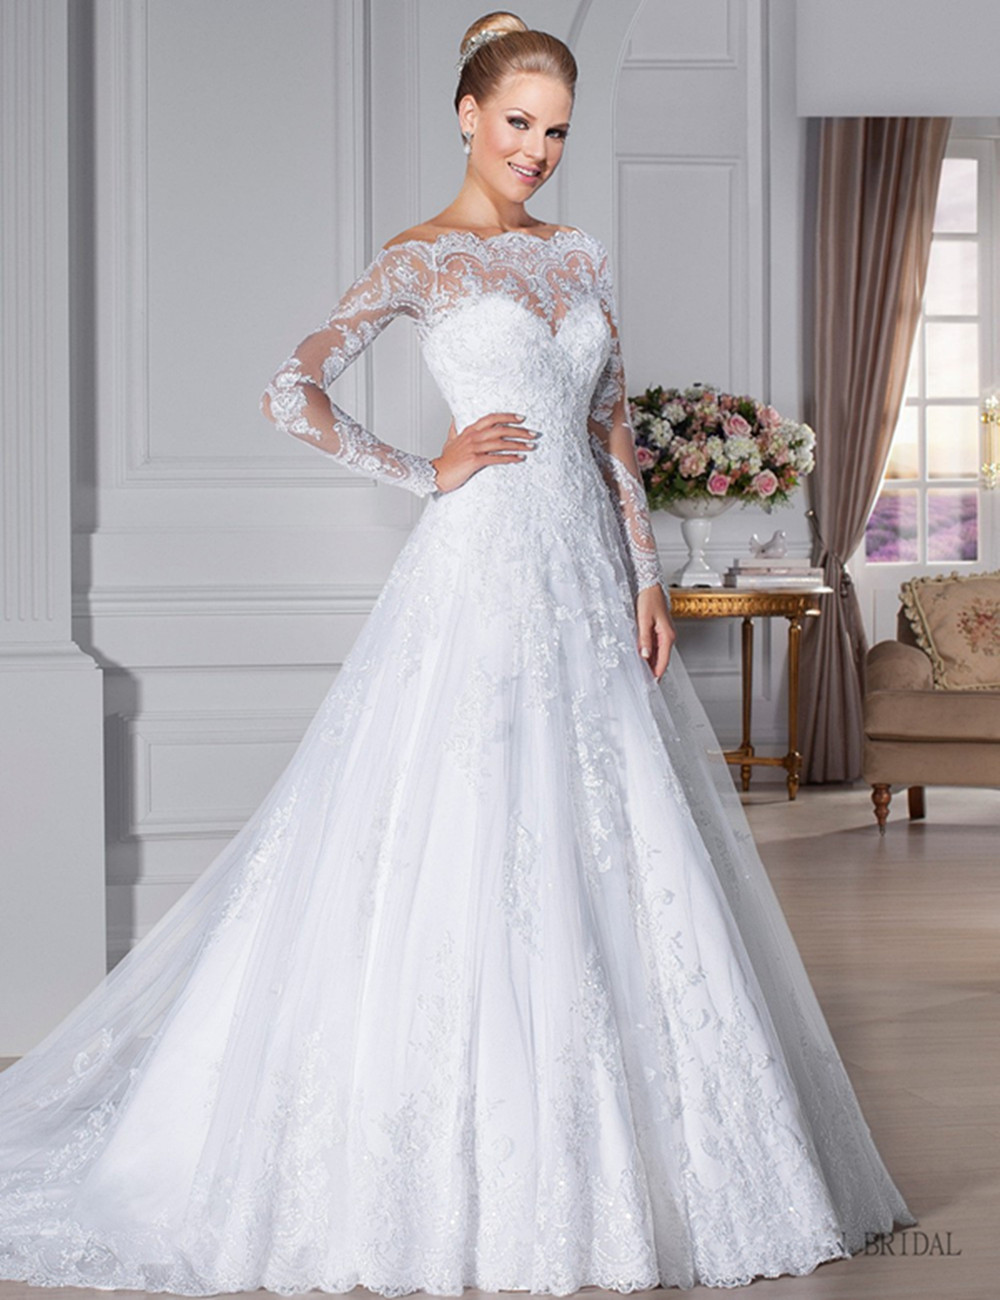 Vestido De Noiva Wedding dress Custom Made Scoop See Through Back Zipper Button Beaded Appliqued Long